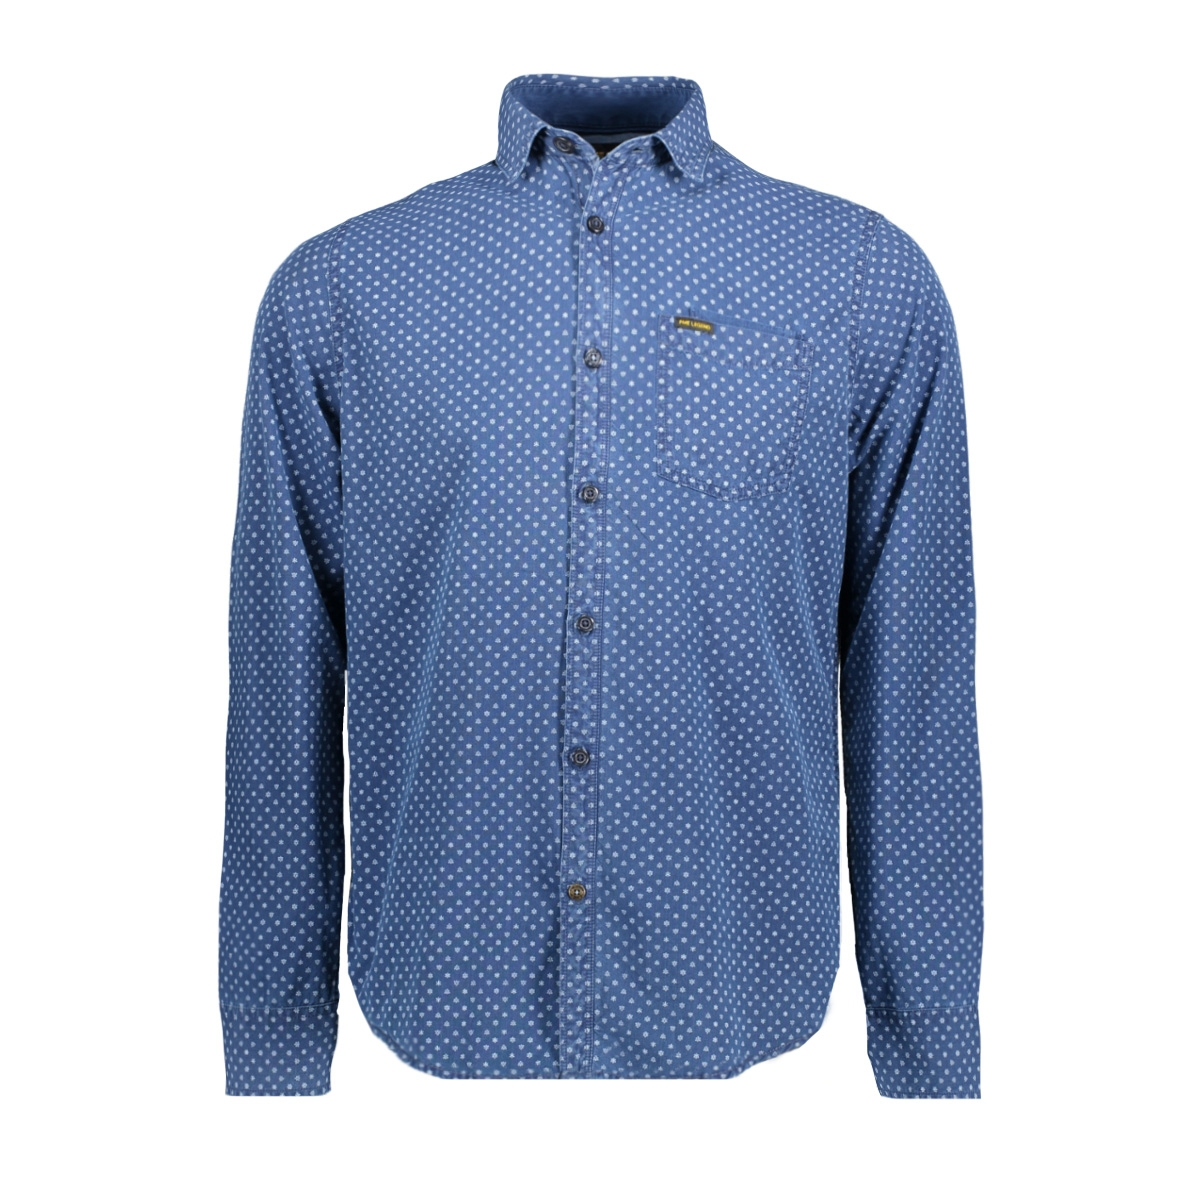 psi176254 pme legend overhemd 590